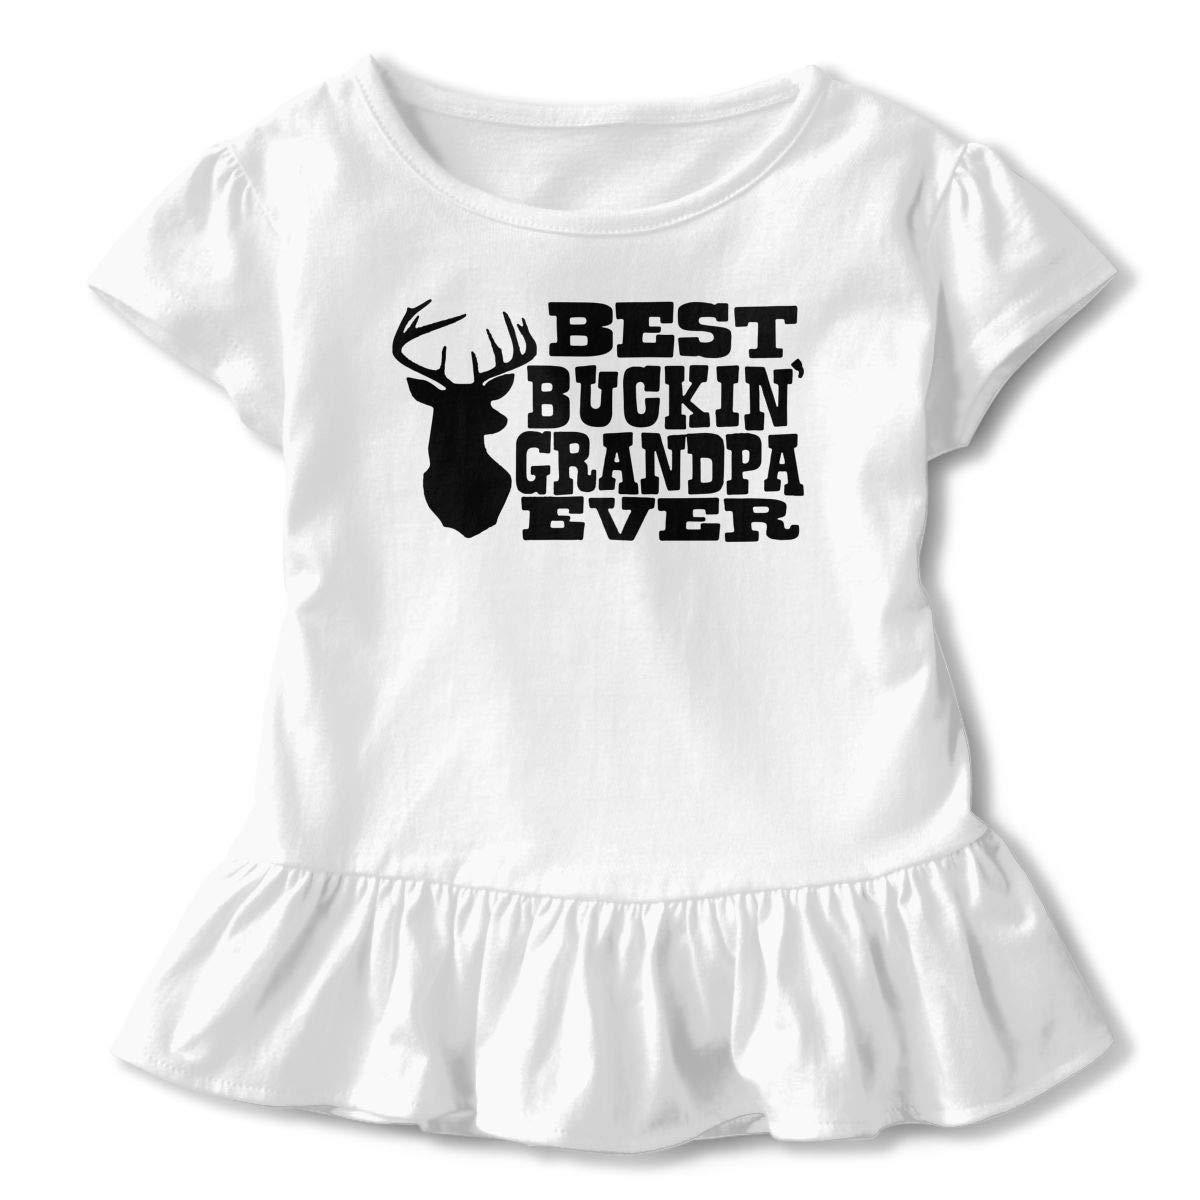 744508a63615 Amazon.com: Girls' Short Sleeve Best Buckin' Grandpa Ever Shirts ...